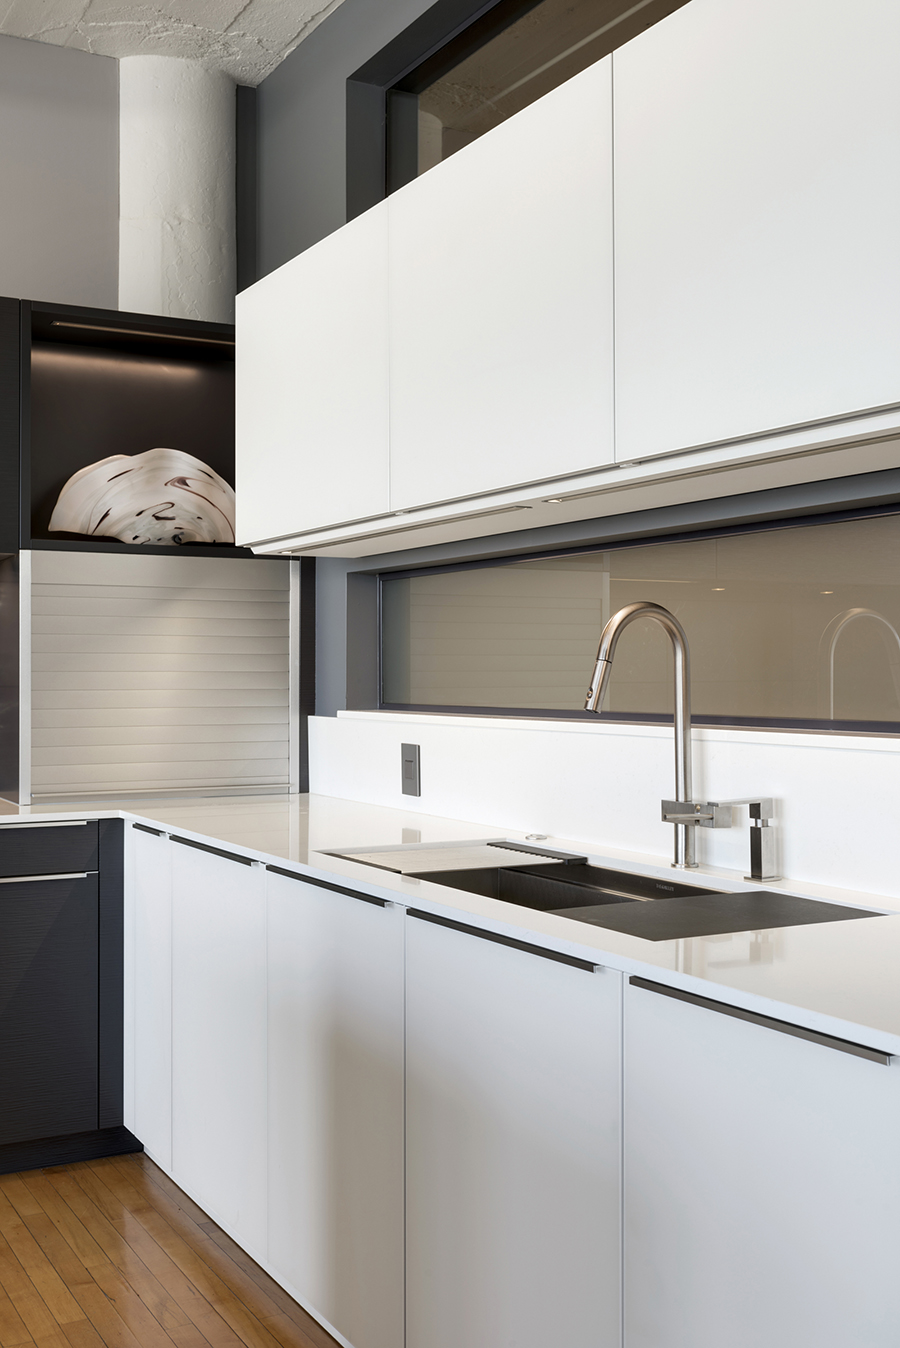 Belle Kitchen Interior Designer Design Minneapolis MN Minnesota Twin Cities 007.jpg